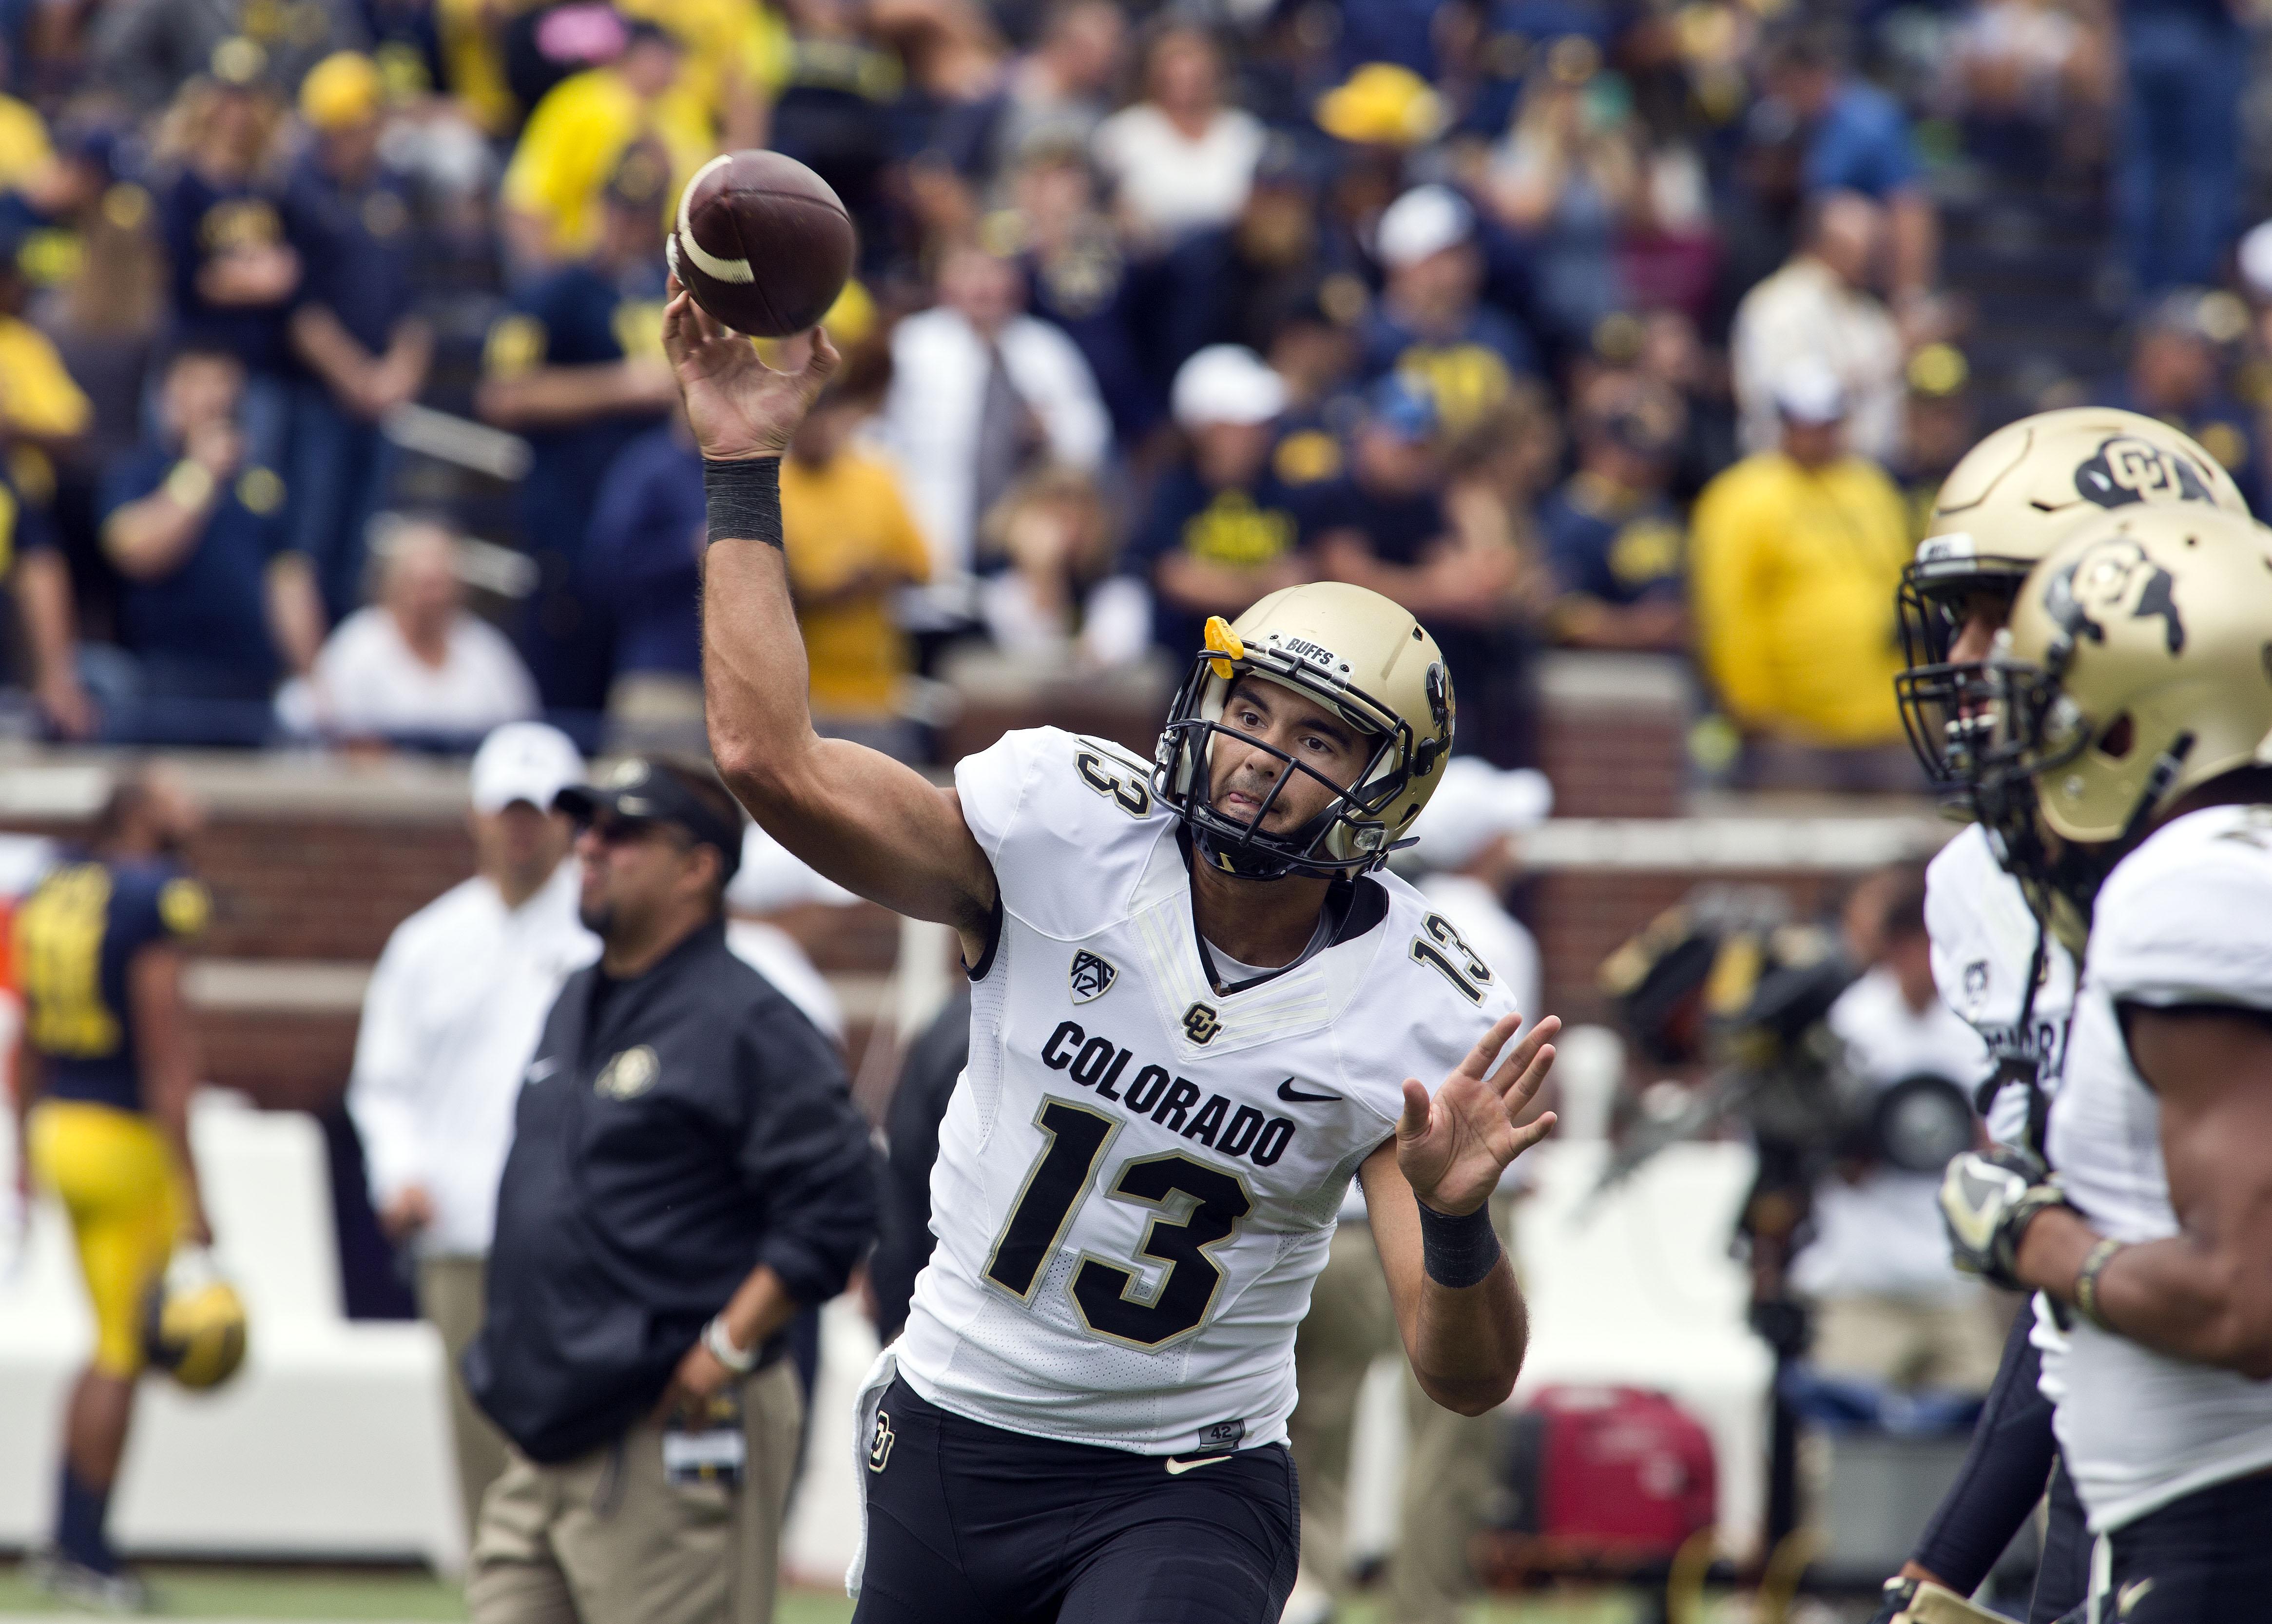 Colorado quarterback Sefo Liufau throws a pass during warmups before an NCAA college football game against Michigan at Michigan Stadium in Ann Arbor, Mich., Saturday, Sept. 17, 2016. (AP Photo/Tony Ding)